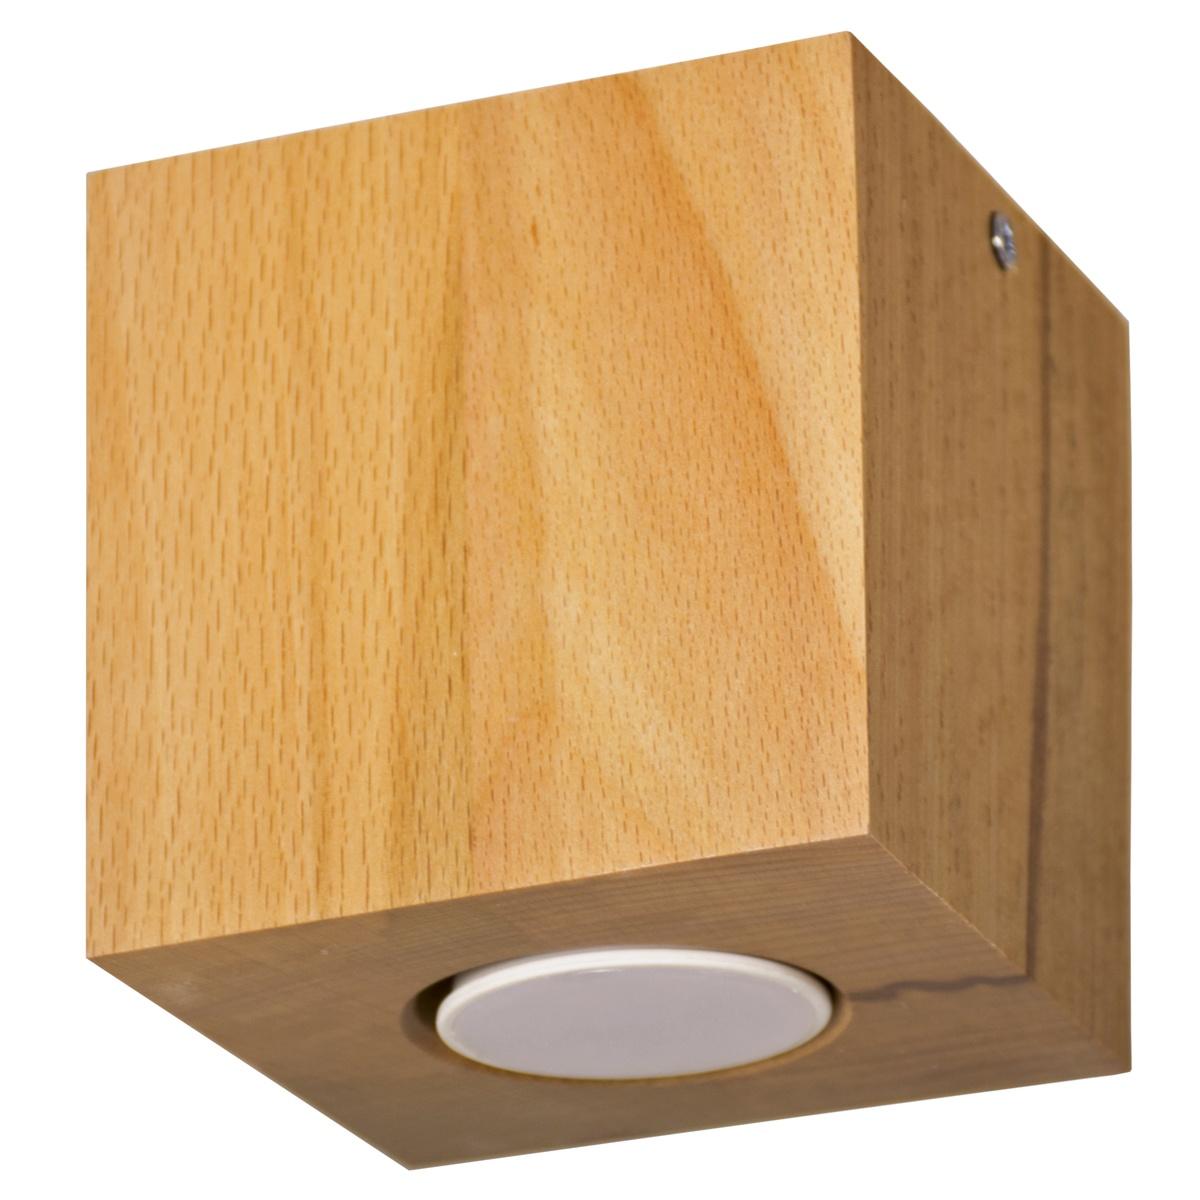 Светильник потолочный Кватро 1хGU10х40Вт накладной светильник дубравия кватро 225 70 61